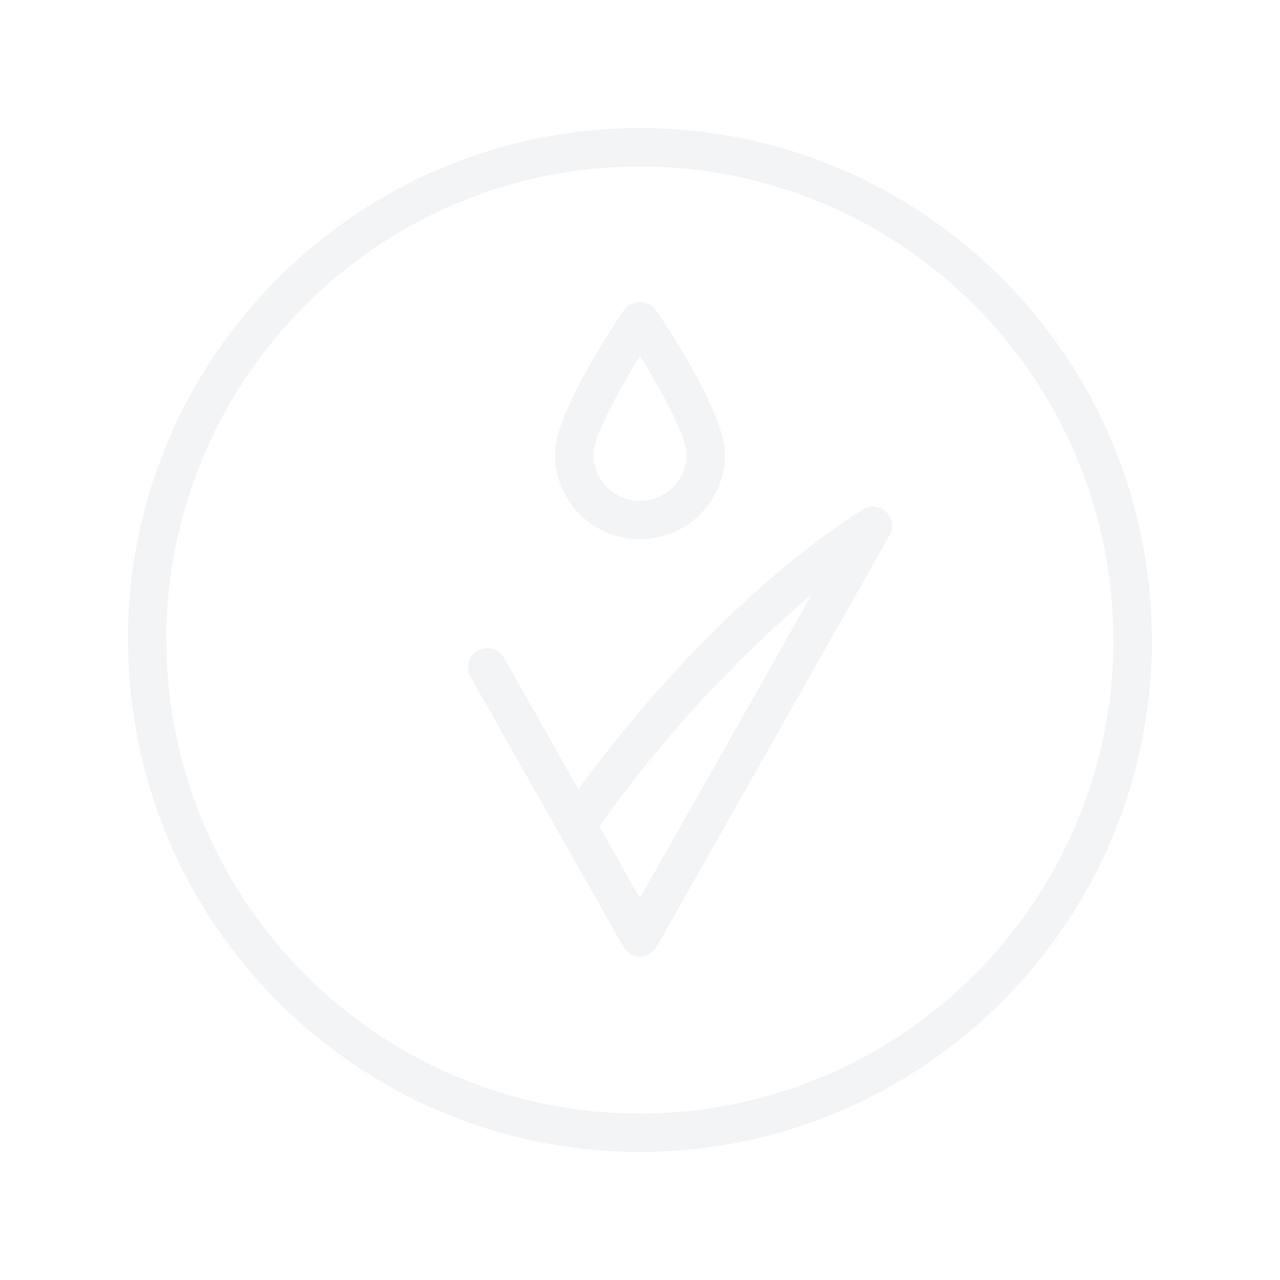 OMA Sheer Tint Protective Lip Balm 4.3g